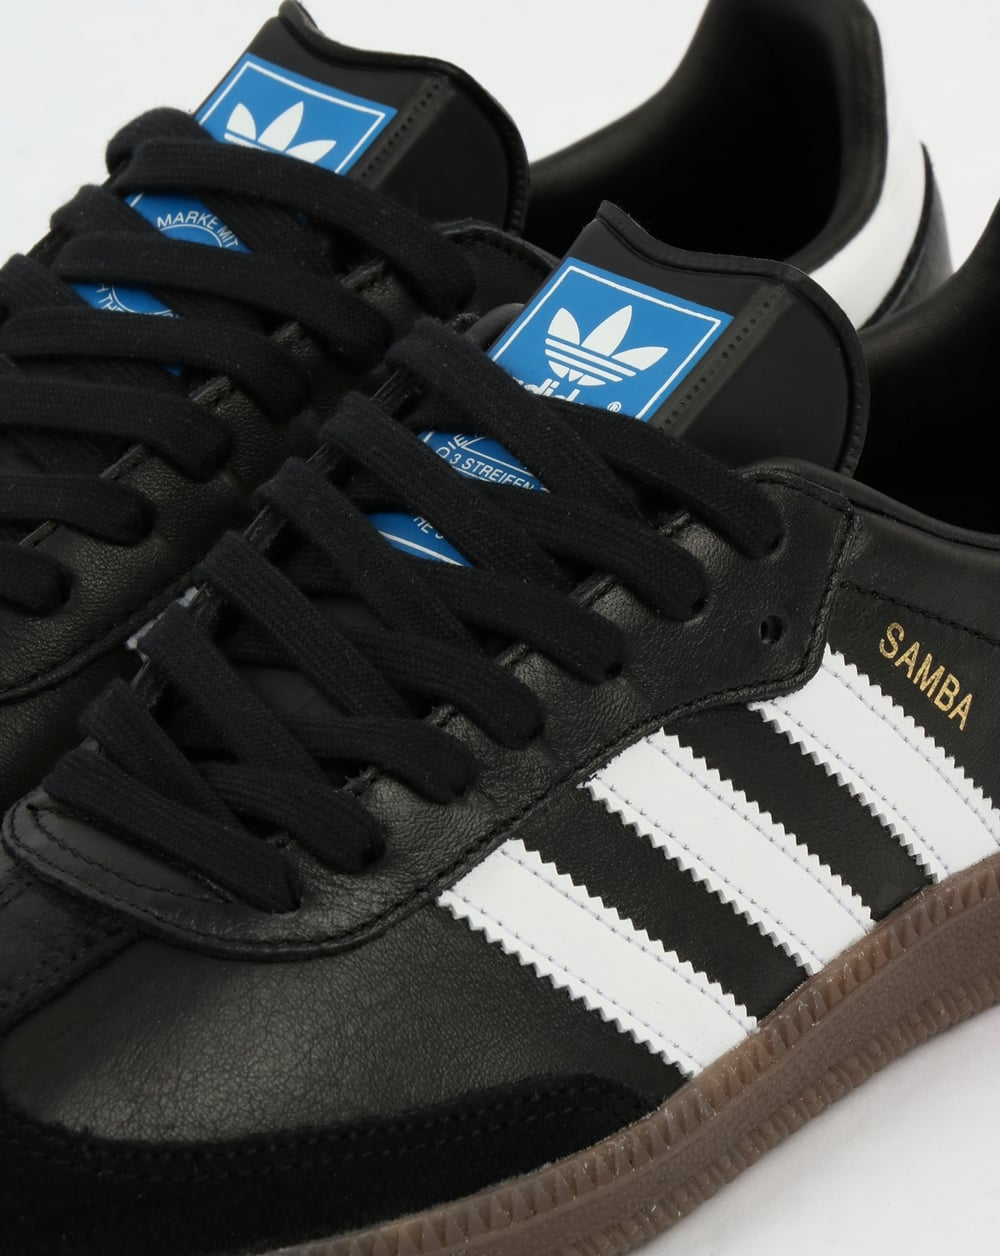 2460c8e5b Adidas Samba OG Trainers Black/White/Gum | 80s casual classics